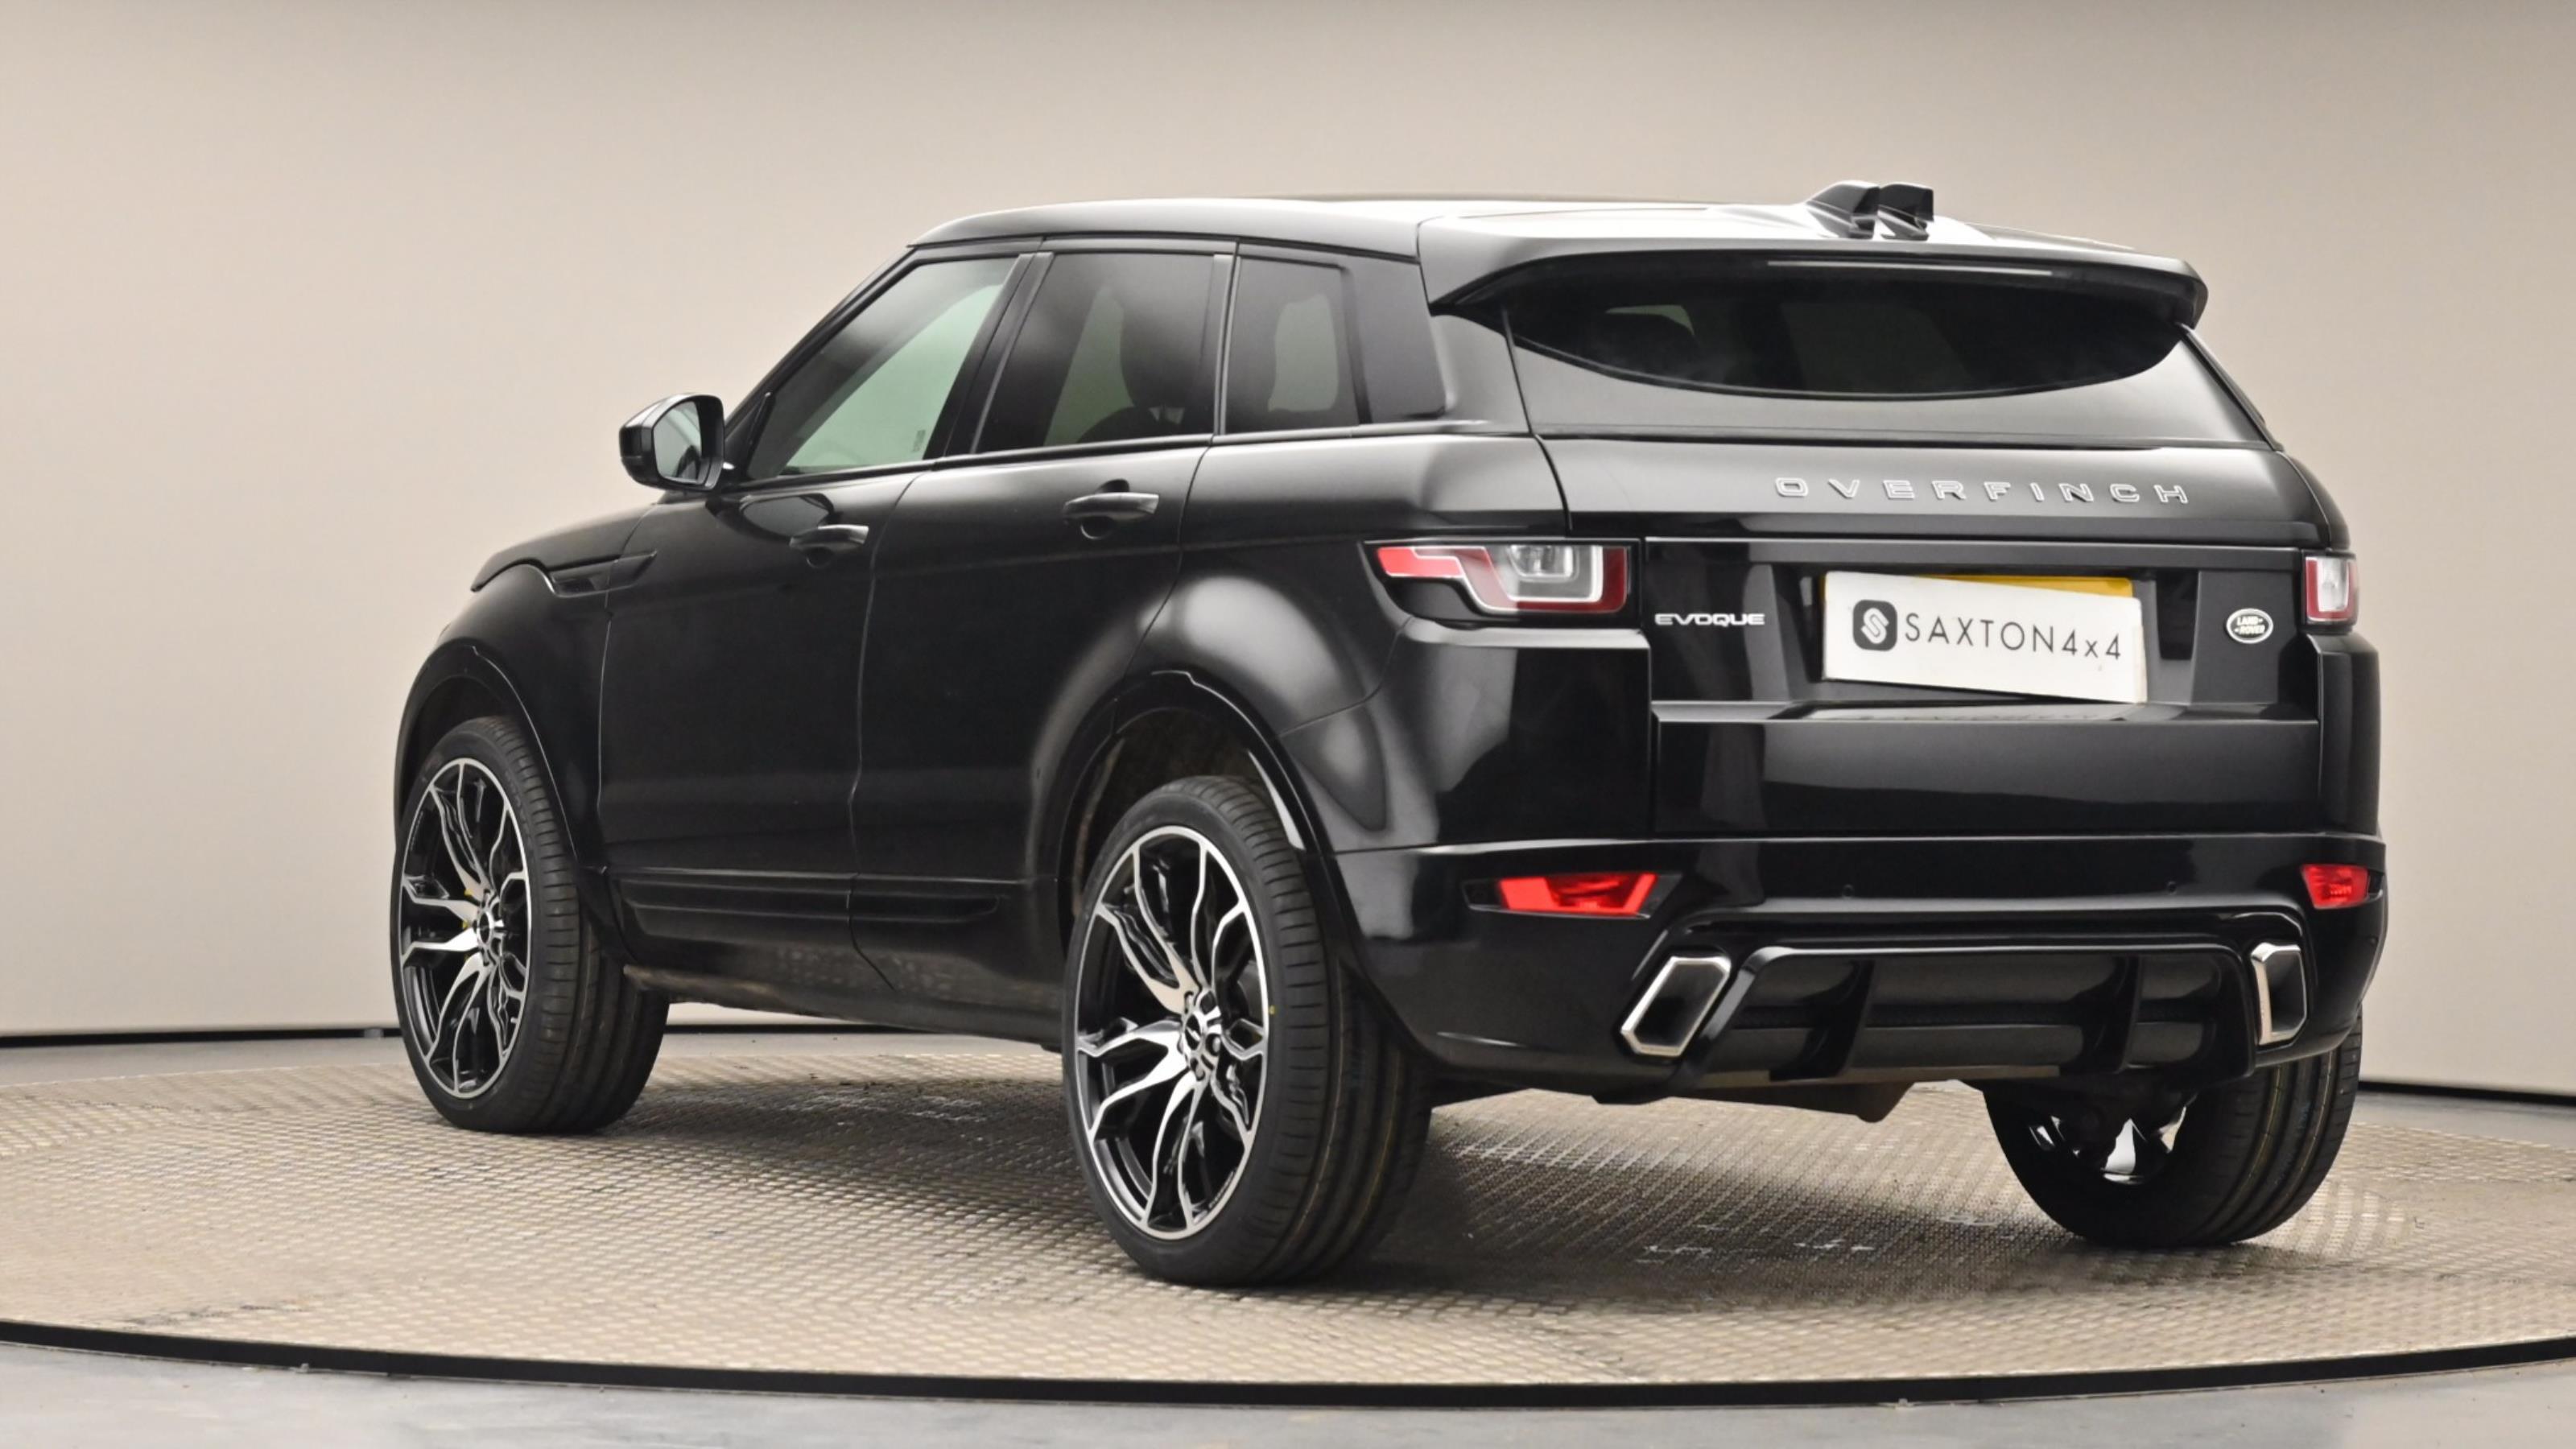 Used 16 Land Rover RANGE ROVER EVOQUE 2.0 TD4 SE Tech 5dr Auto Black at Saxton4x4